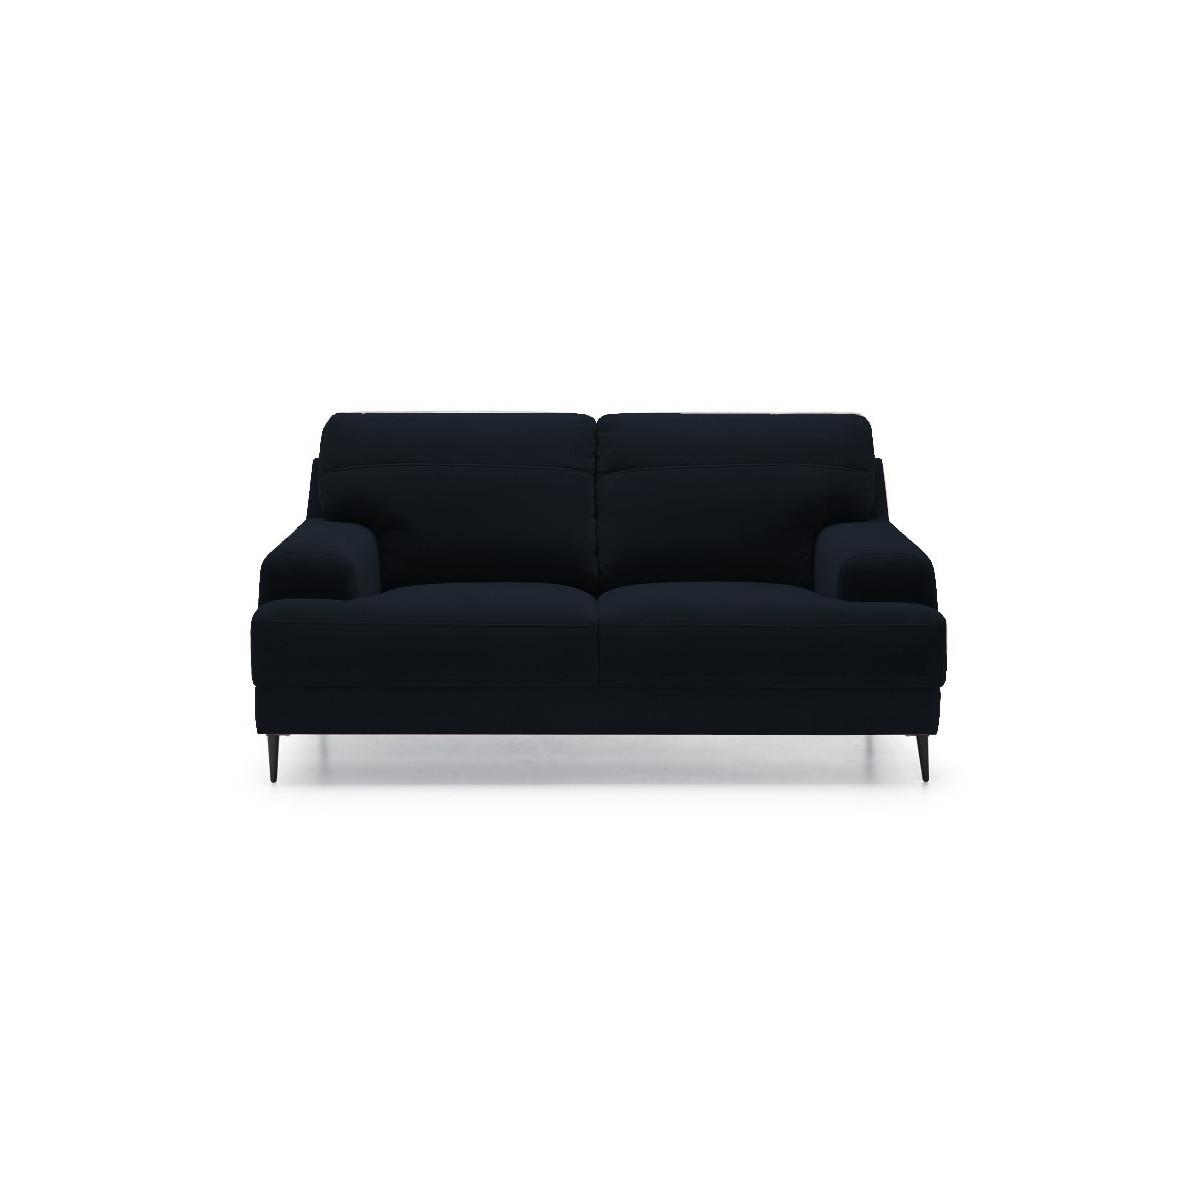 Monday Sofa 2 167cm